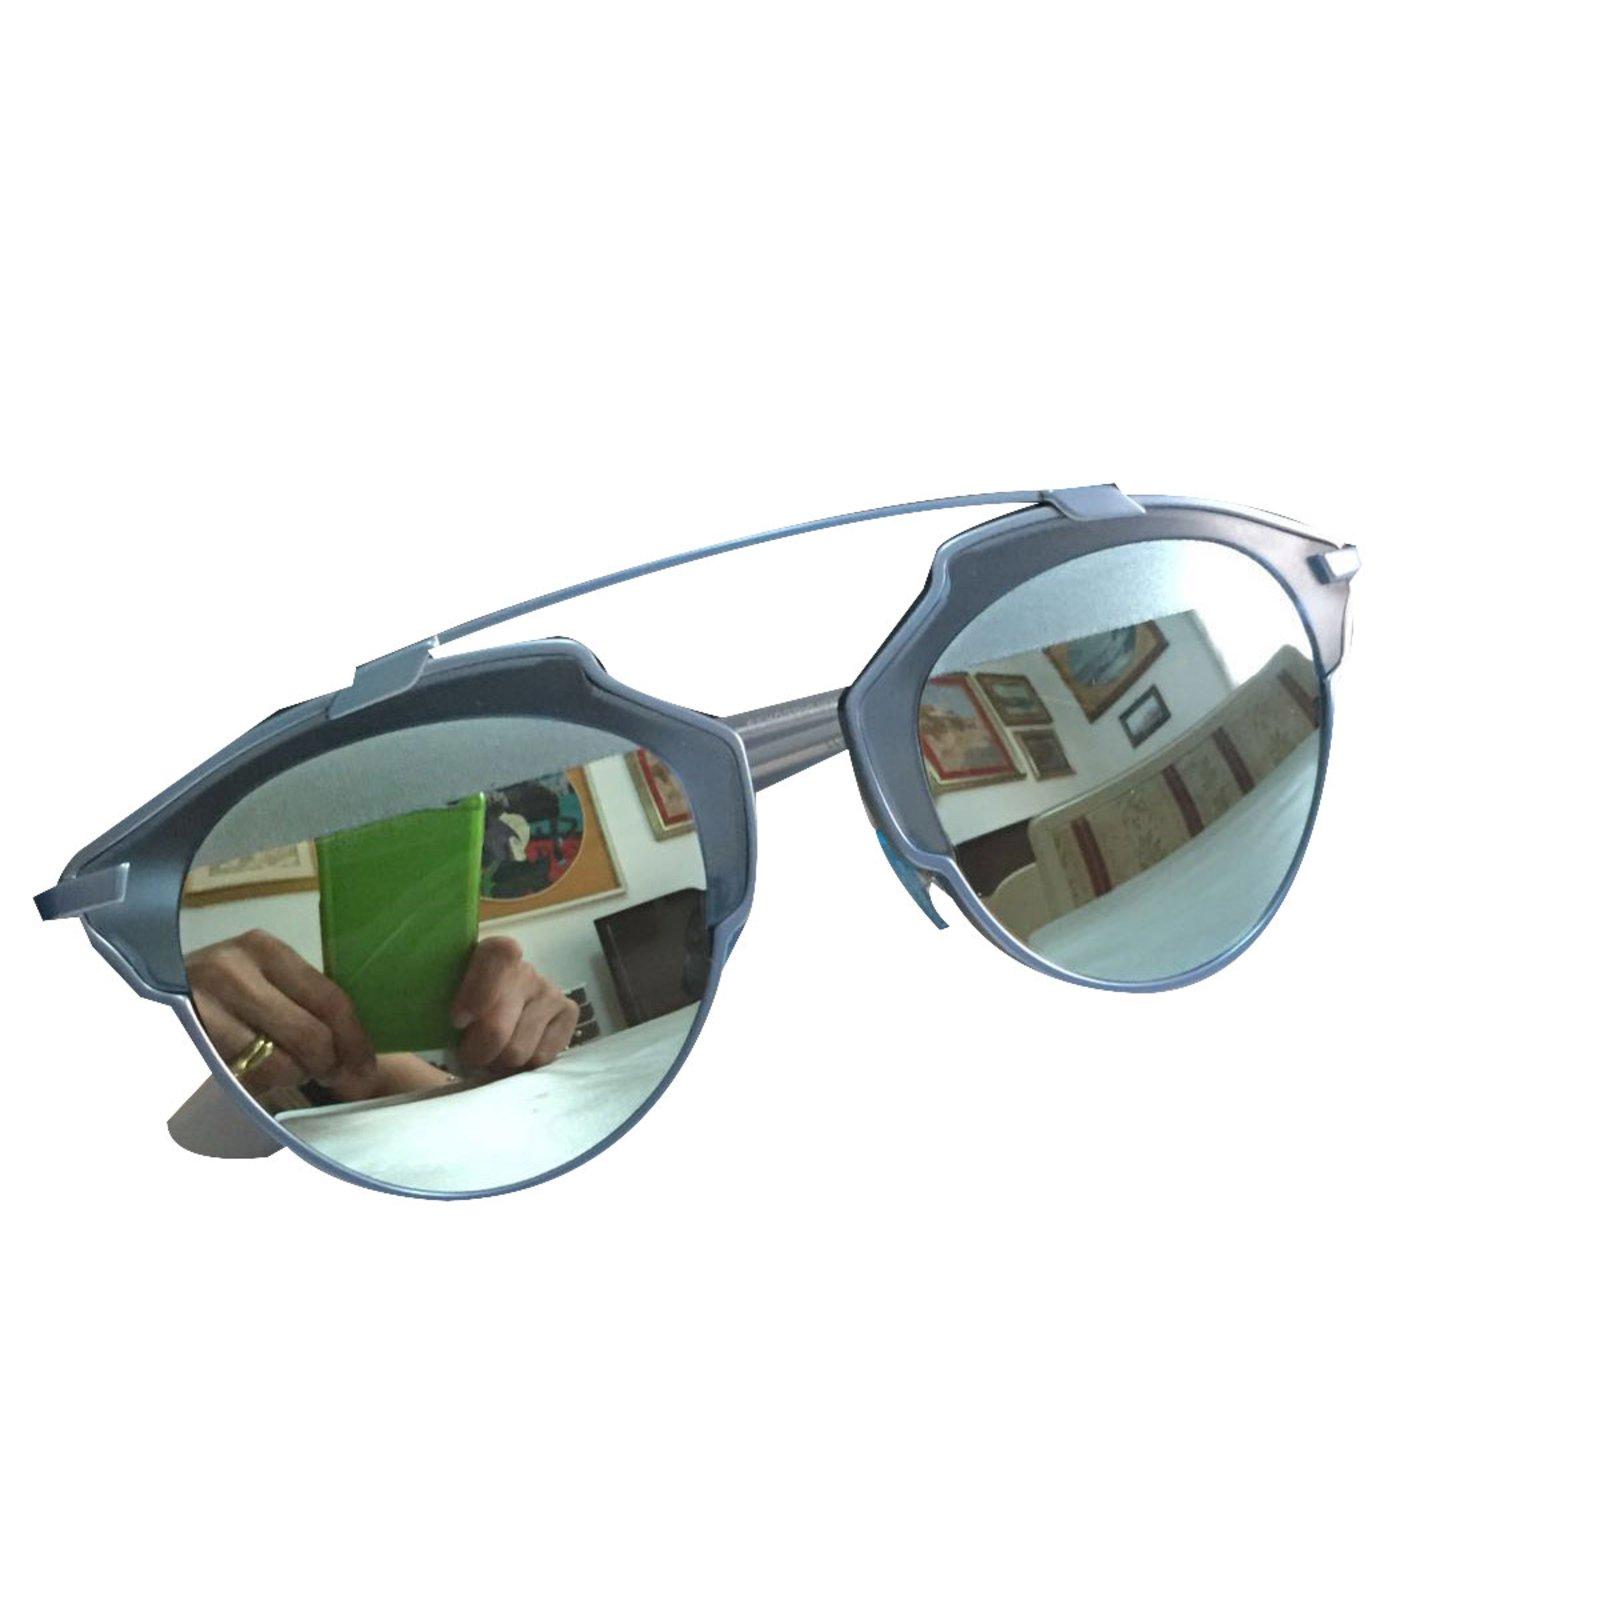 59c3fbde1fa6 Dior Sunglasses Sunglasses Metal Blue ref.19744 - Joli Closet